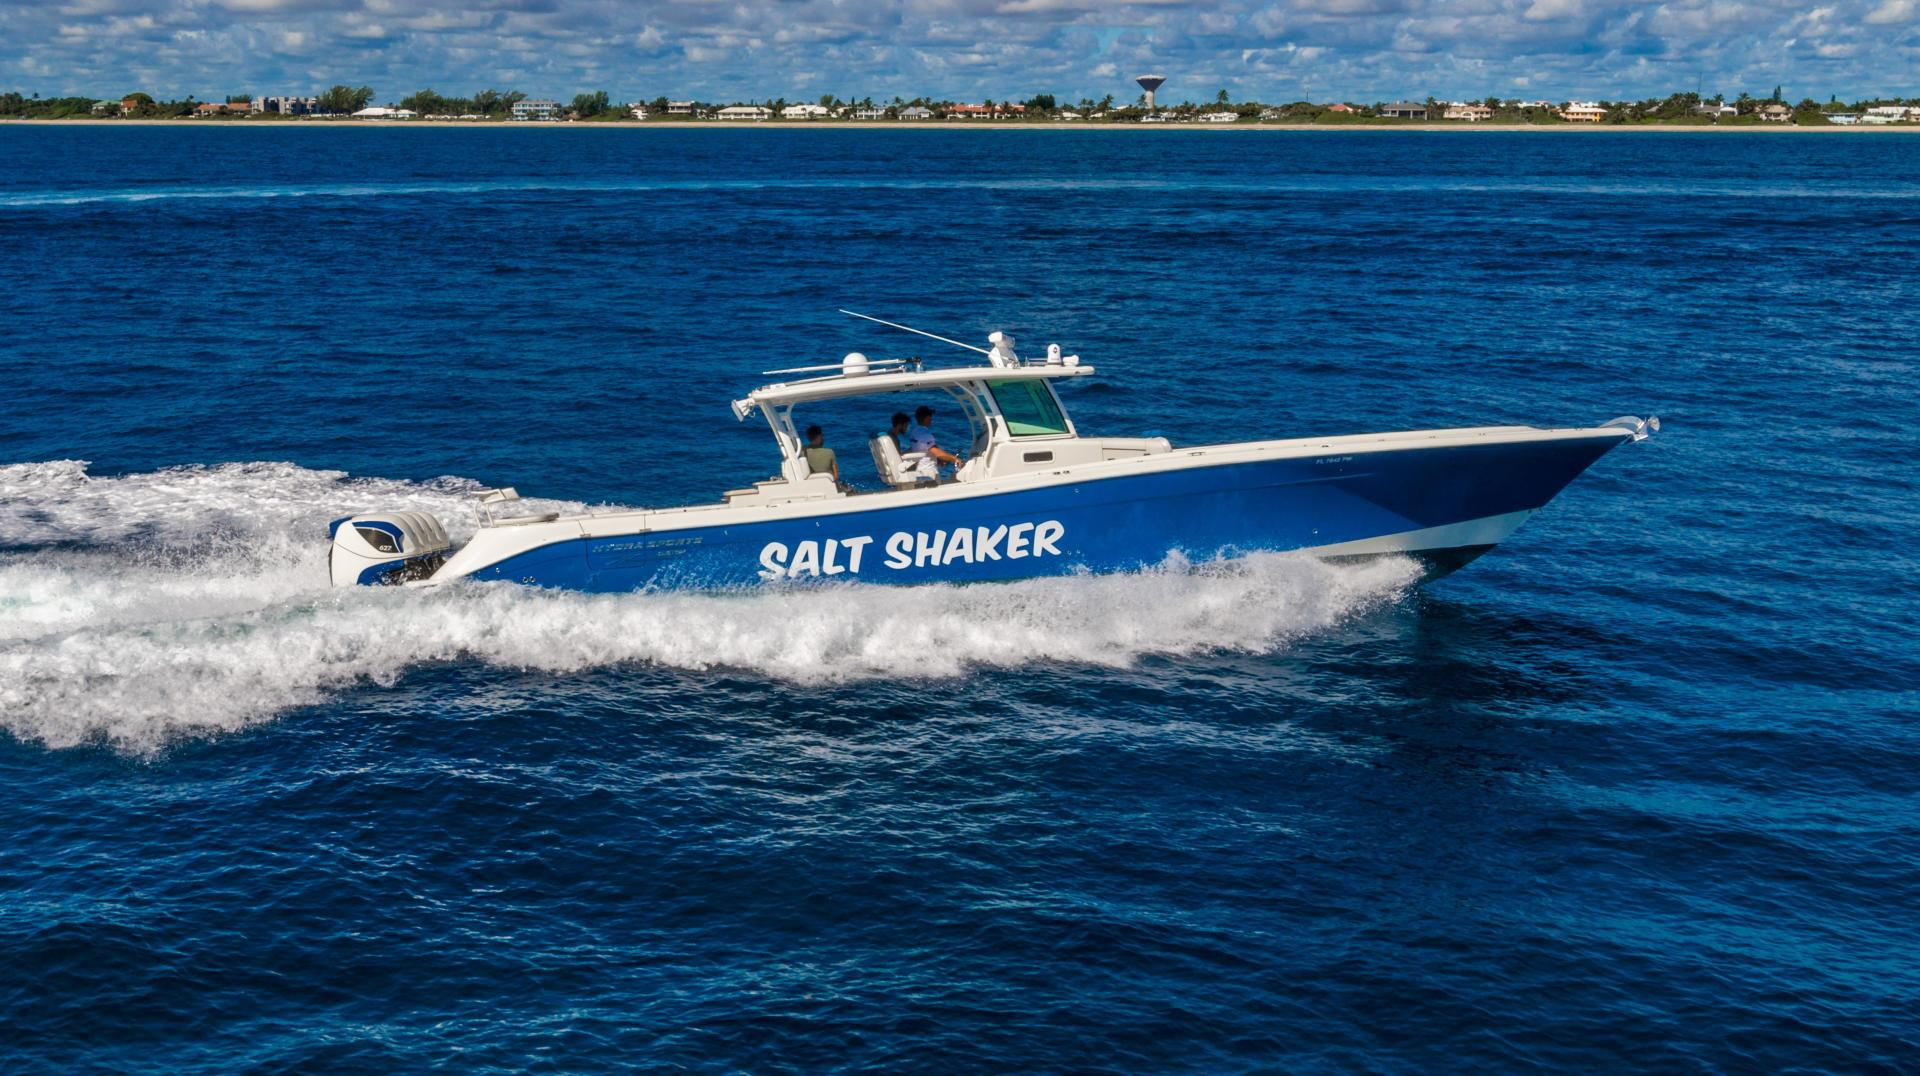 HCB-Suenos 2016-Salt Shaker Ft. Lauderdale-Florida-United States-1548632 | Thumbnail